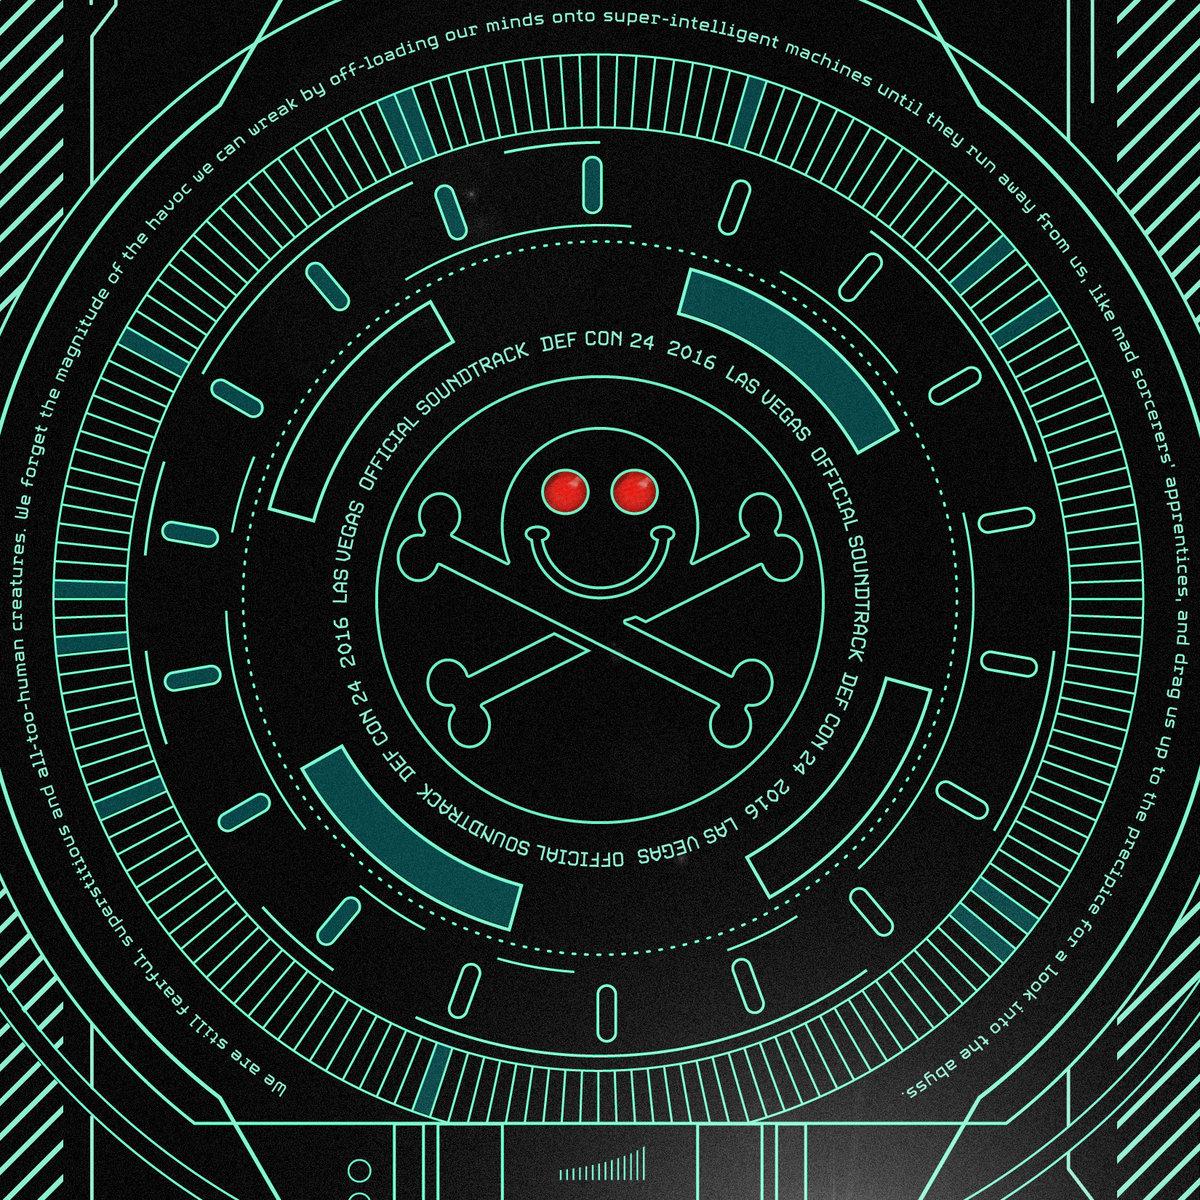 DEF CON 24: The Official Soundtrack | Gravitas Recordings